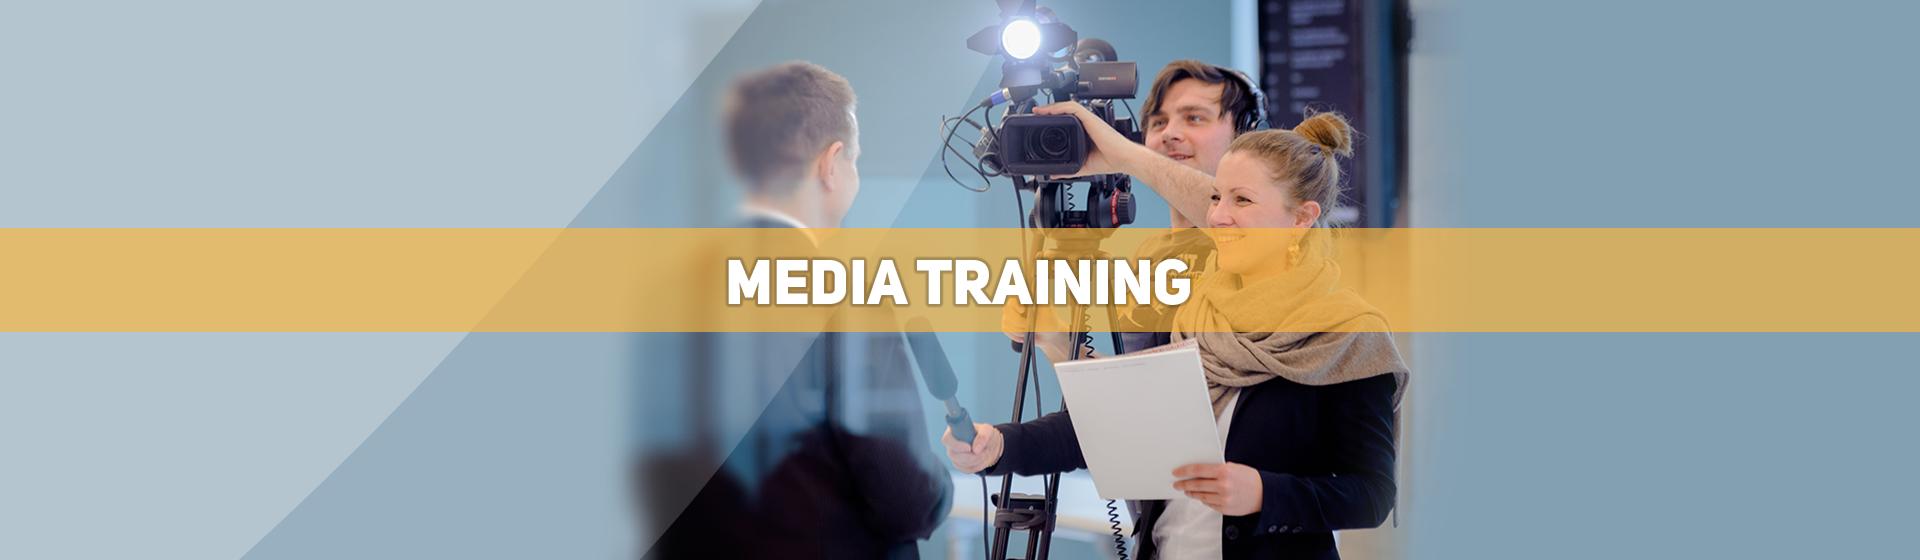 Banner media training3